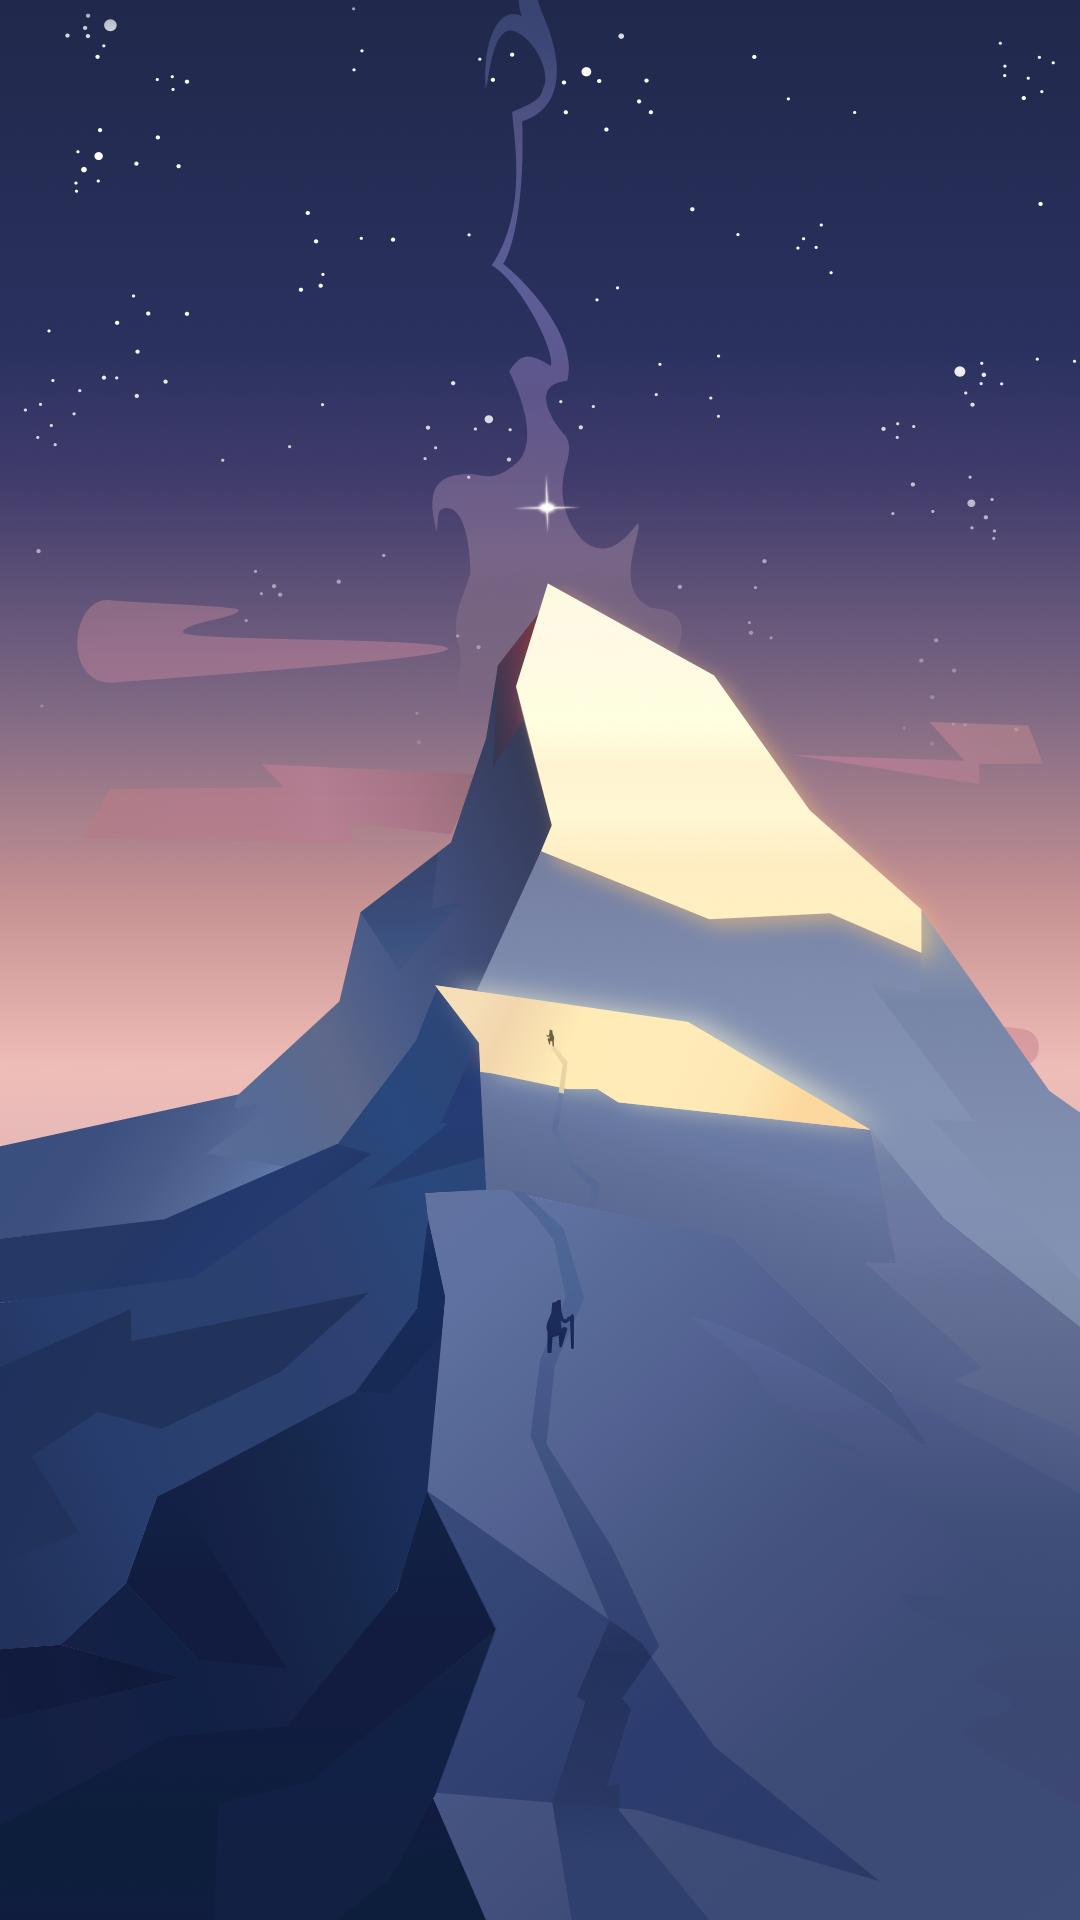 Minimalist Heartstone Android Background in 2020 Minimal